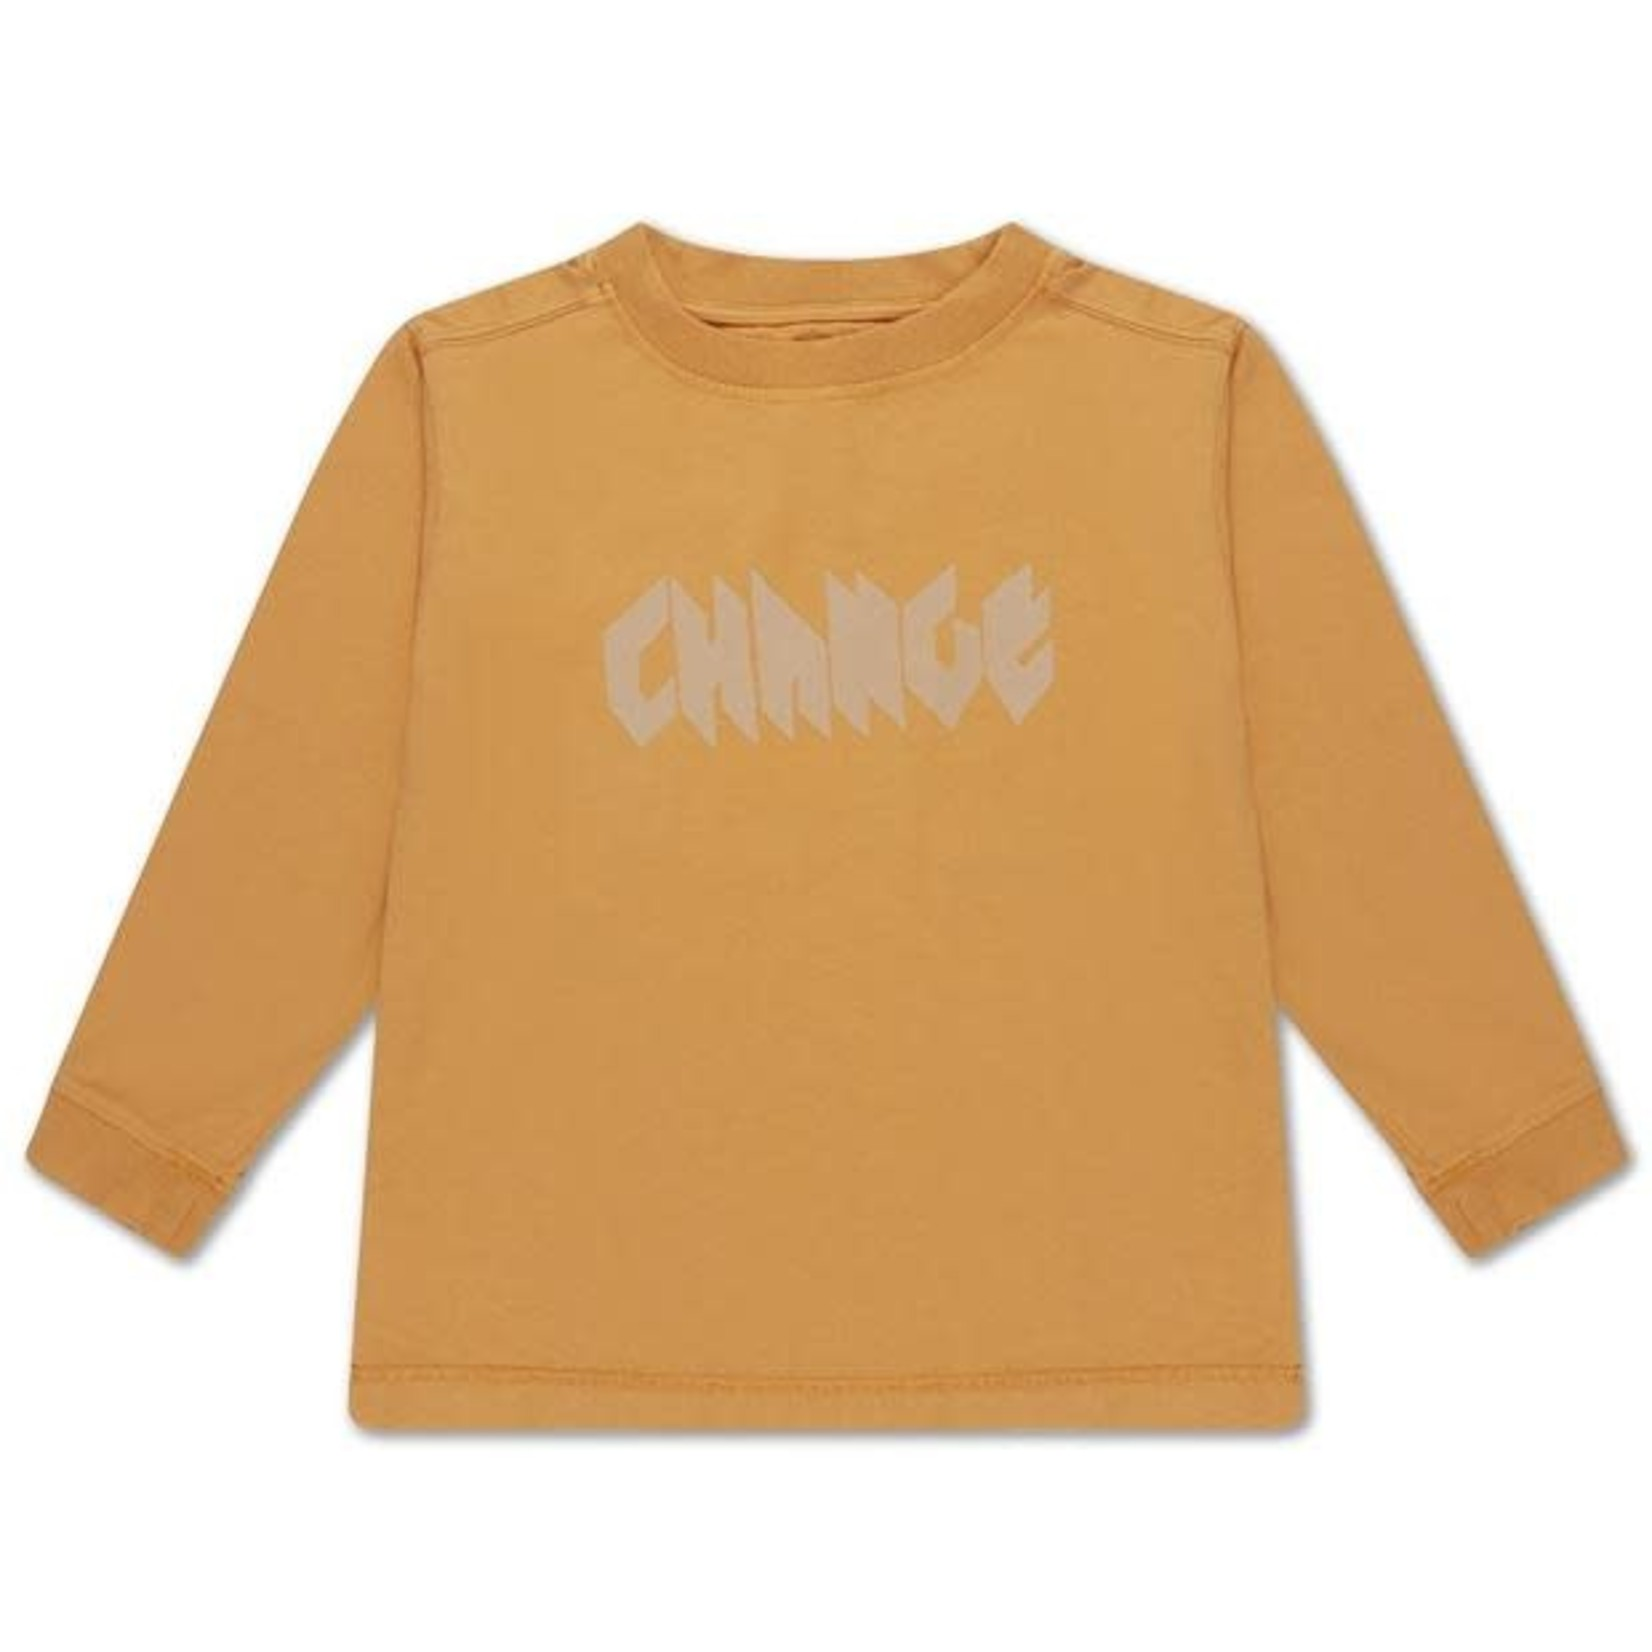 REPOSE AMS REPOSE t-shirt lange mouw